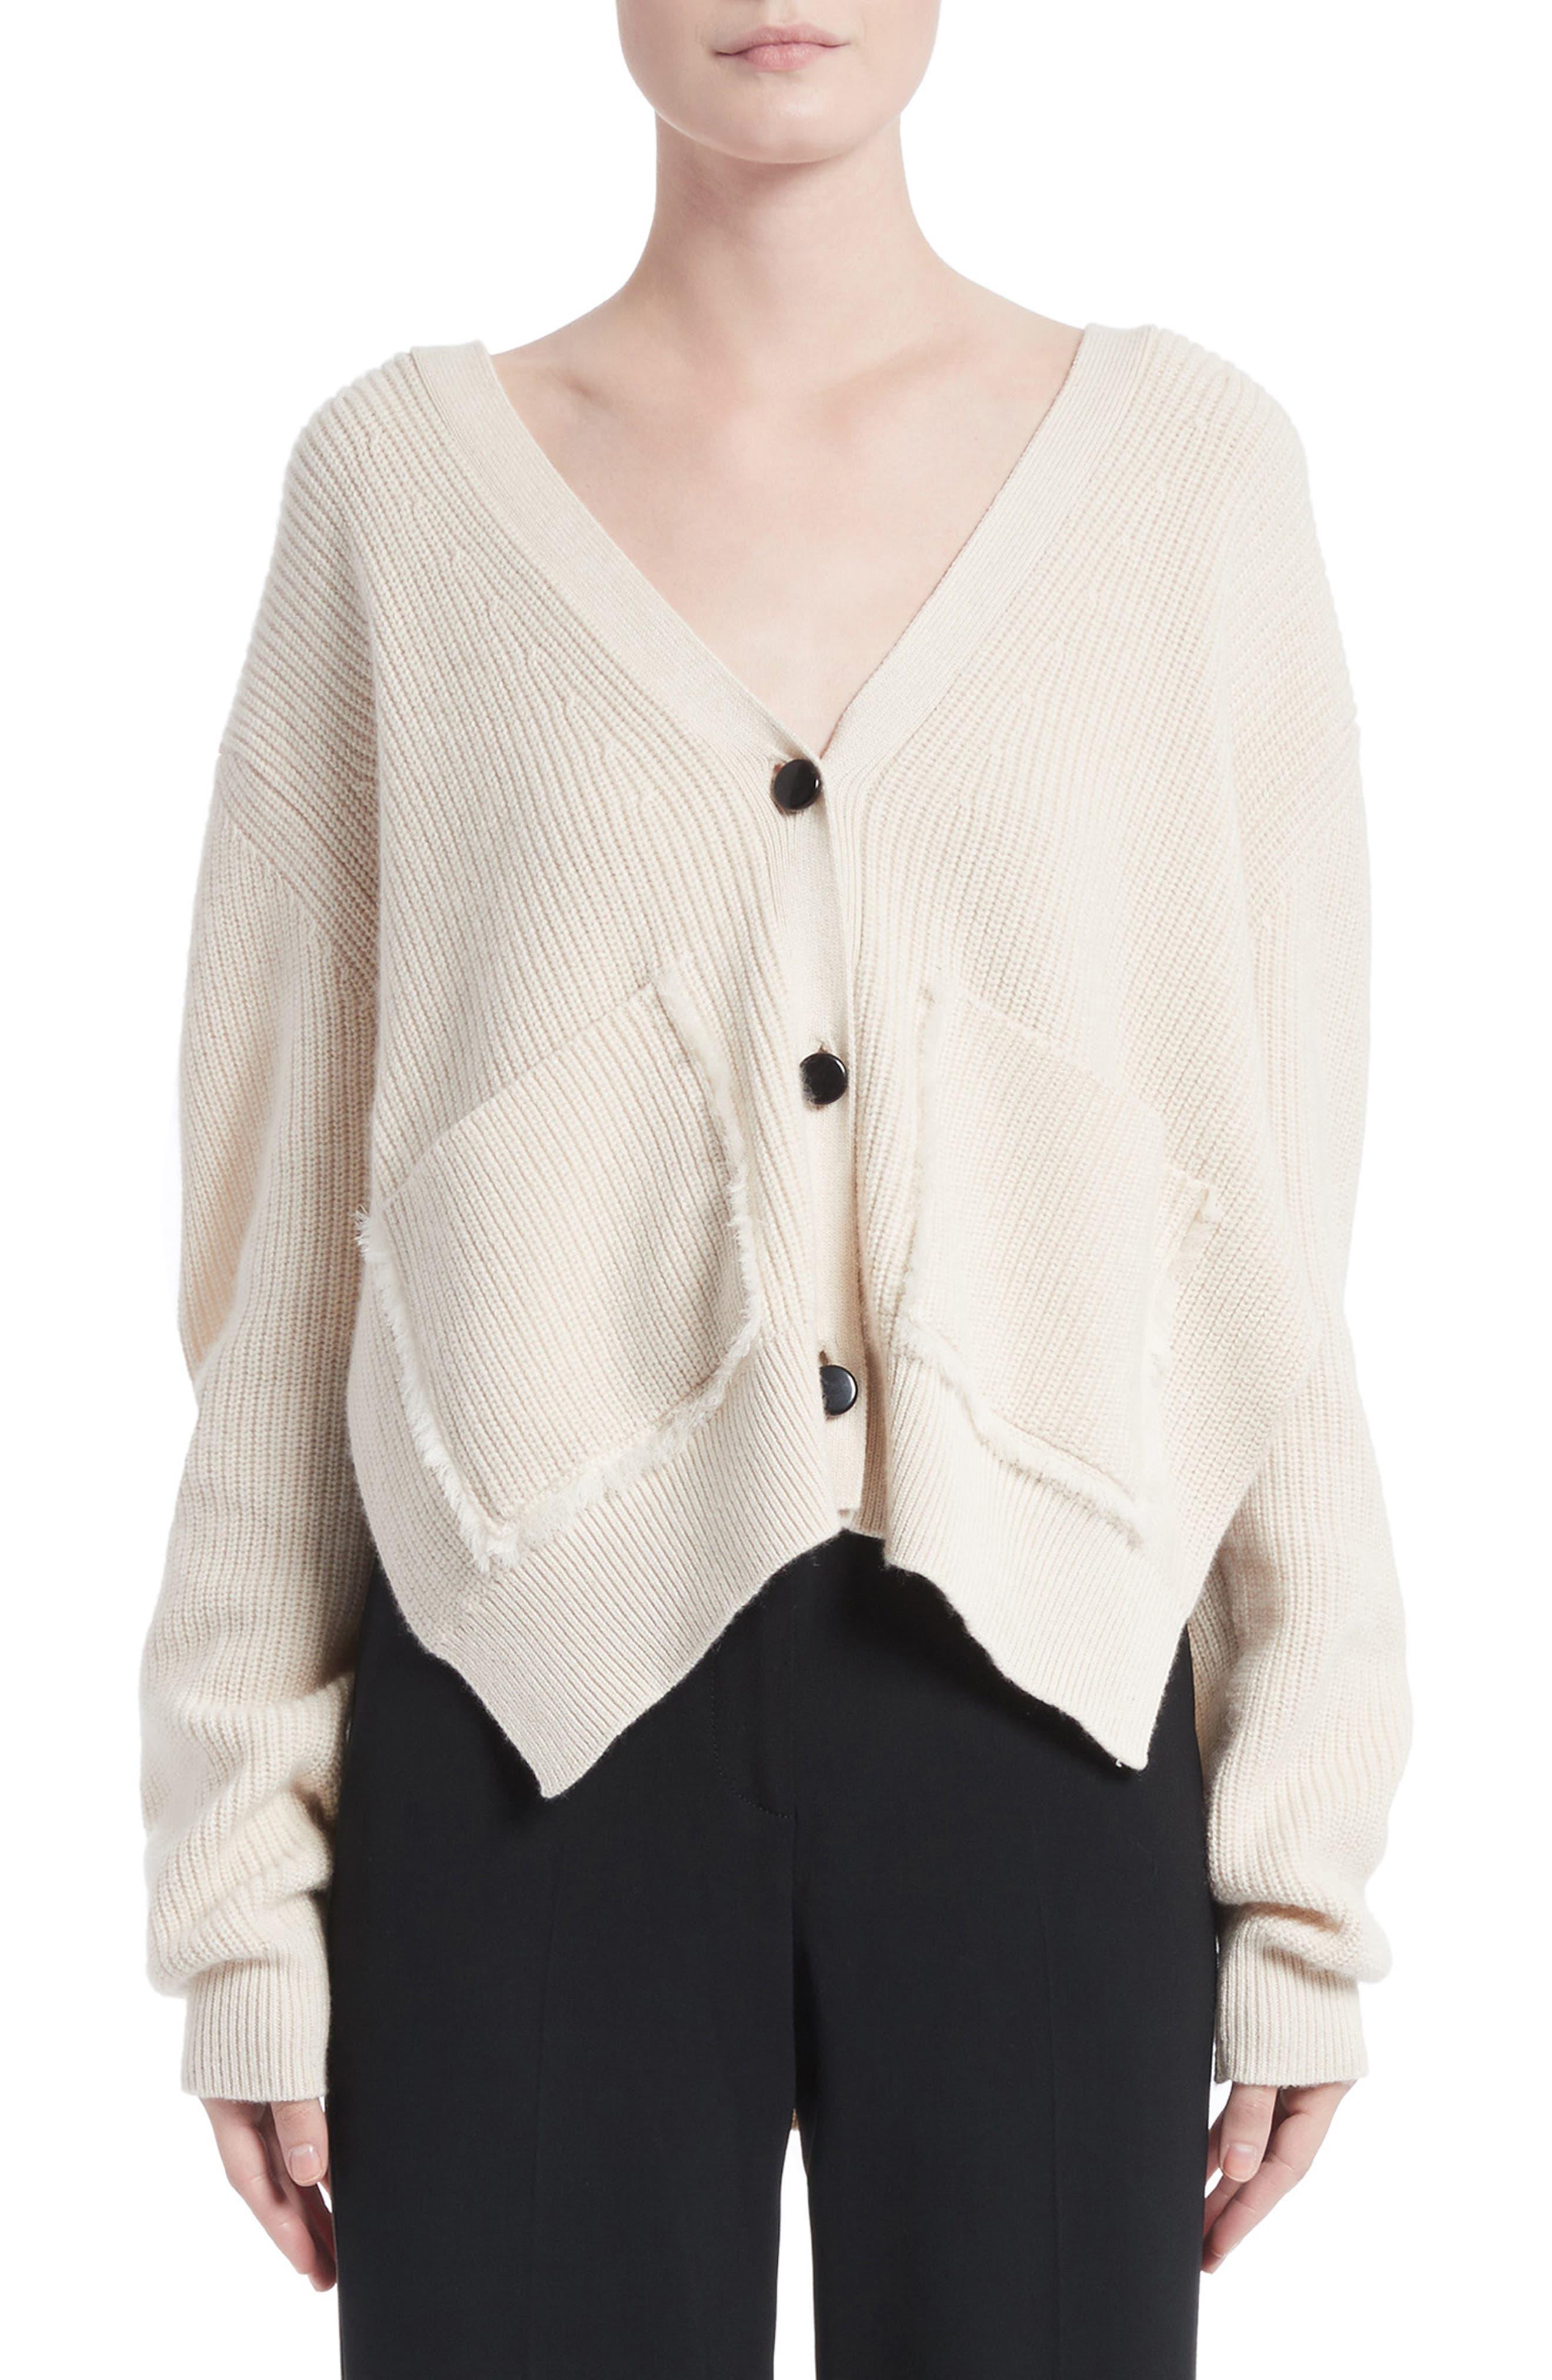 Main Image - Proenza Schouler Cotton & Cashmere Cardigan